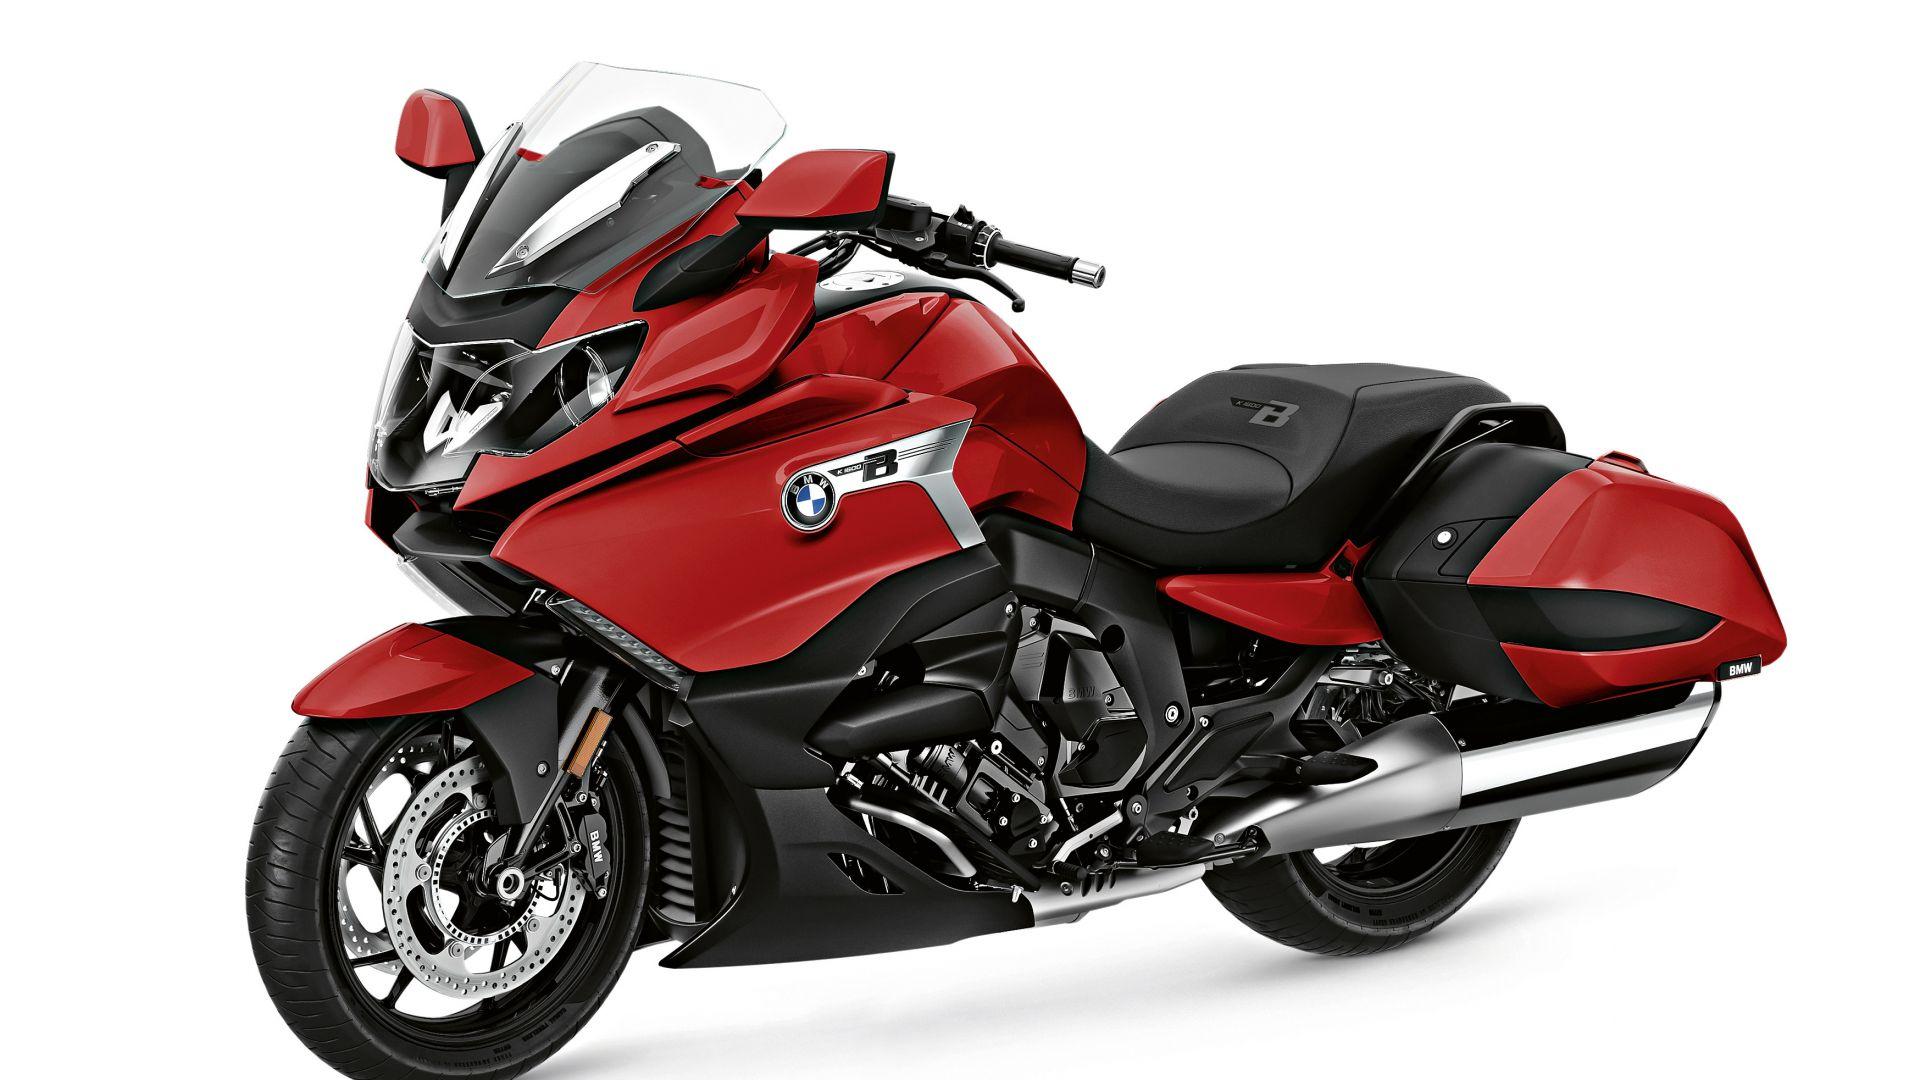 Novità BMW 2021: R 1250 GS, R 1250 RS, K 1600, S 1000 XR e